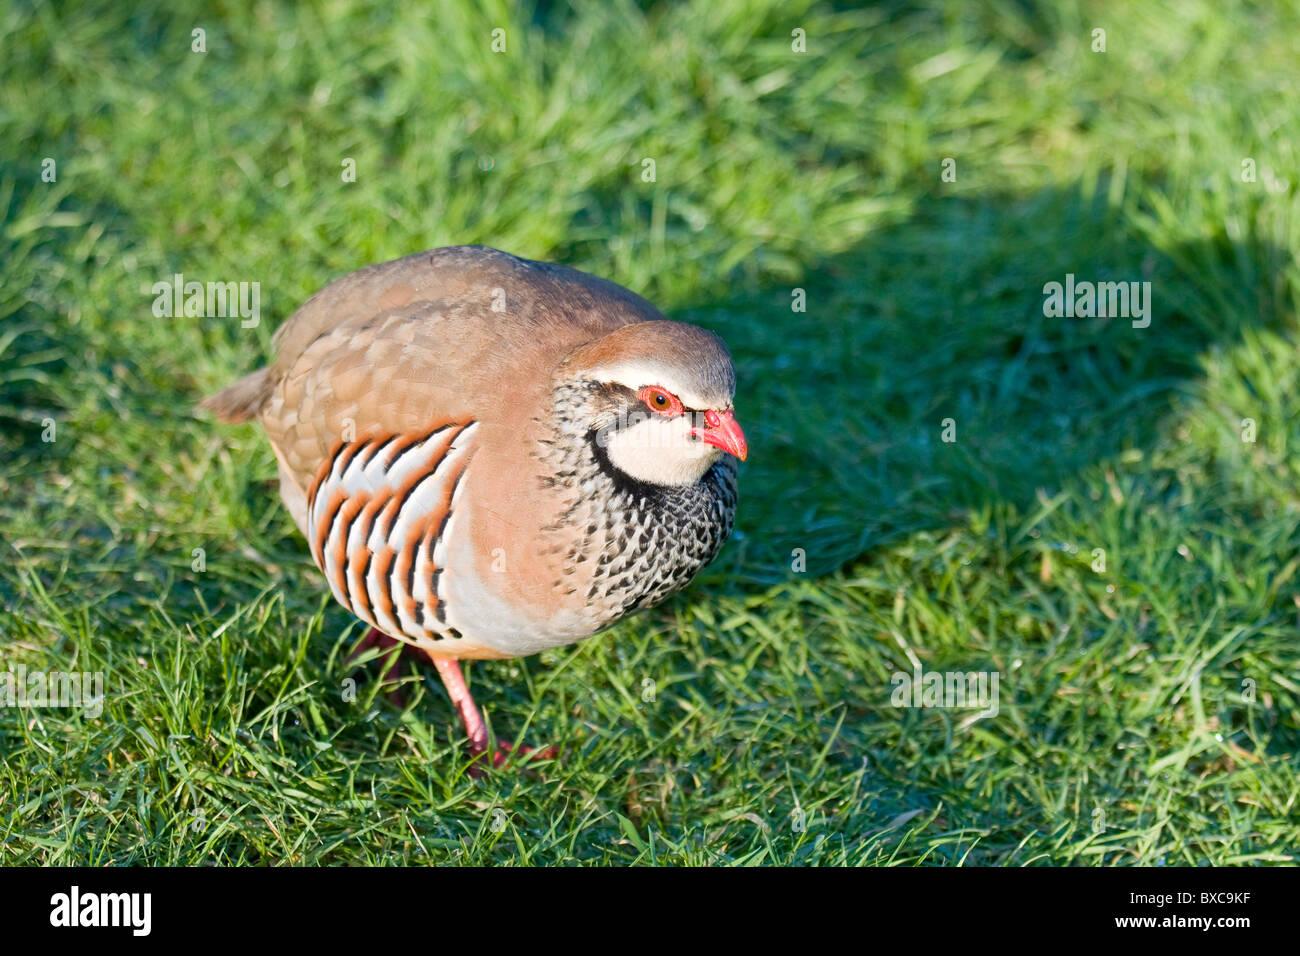 Red-Legged Partridge on Garden Lawn - Stock Image